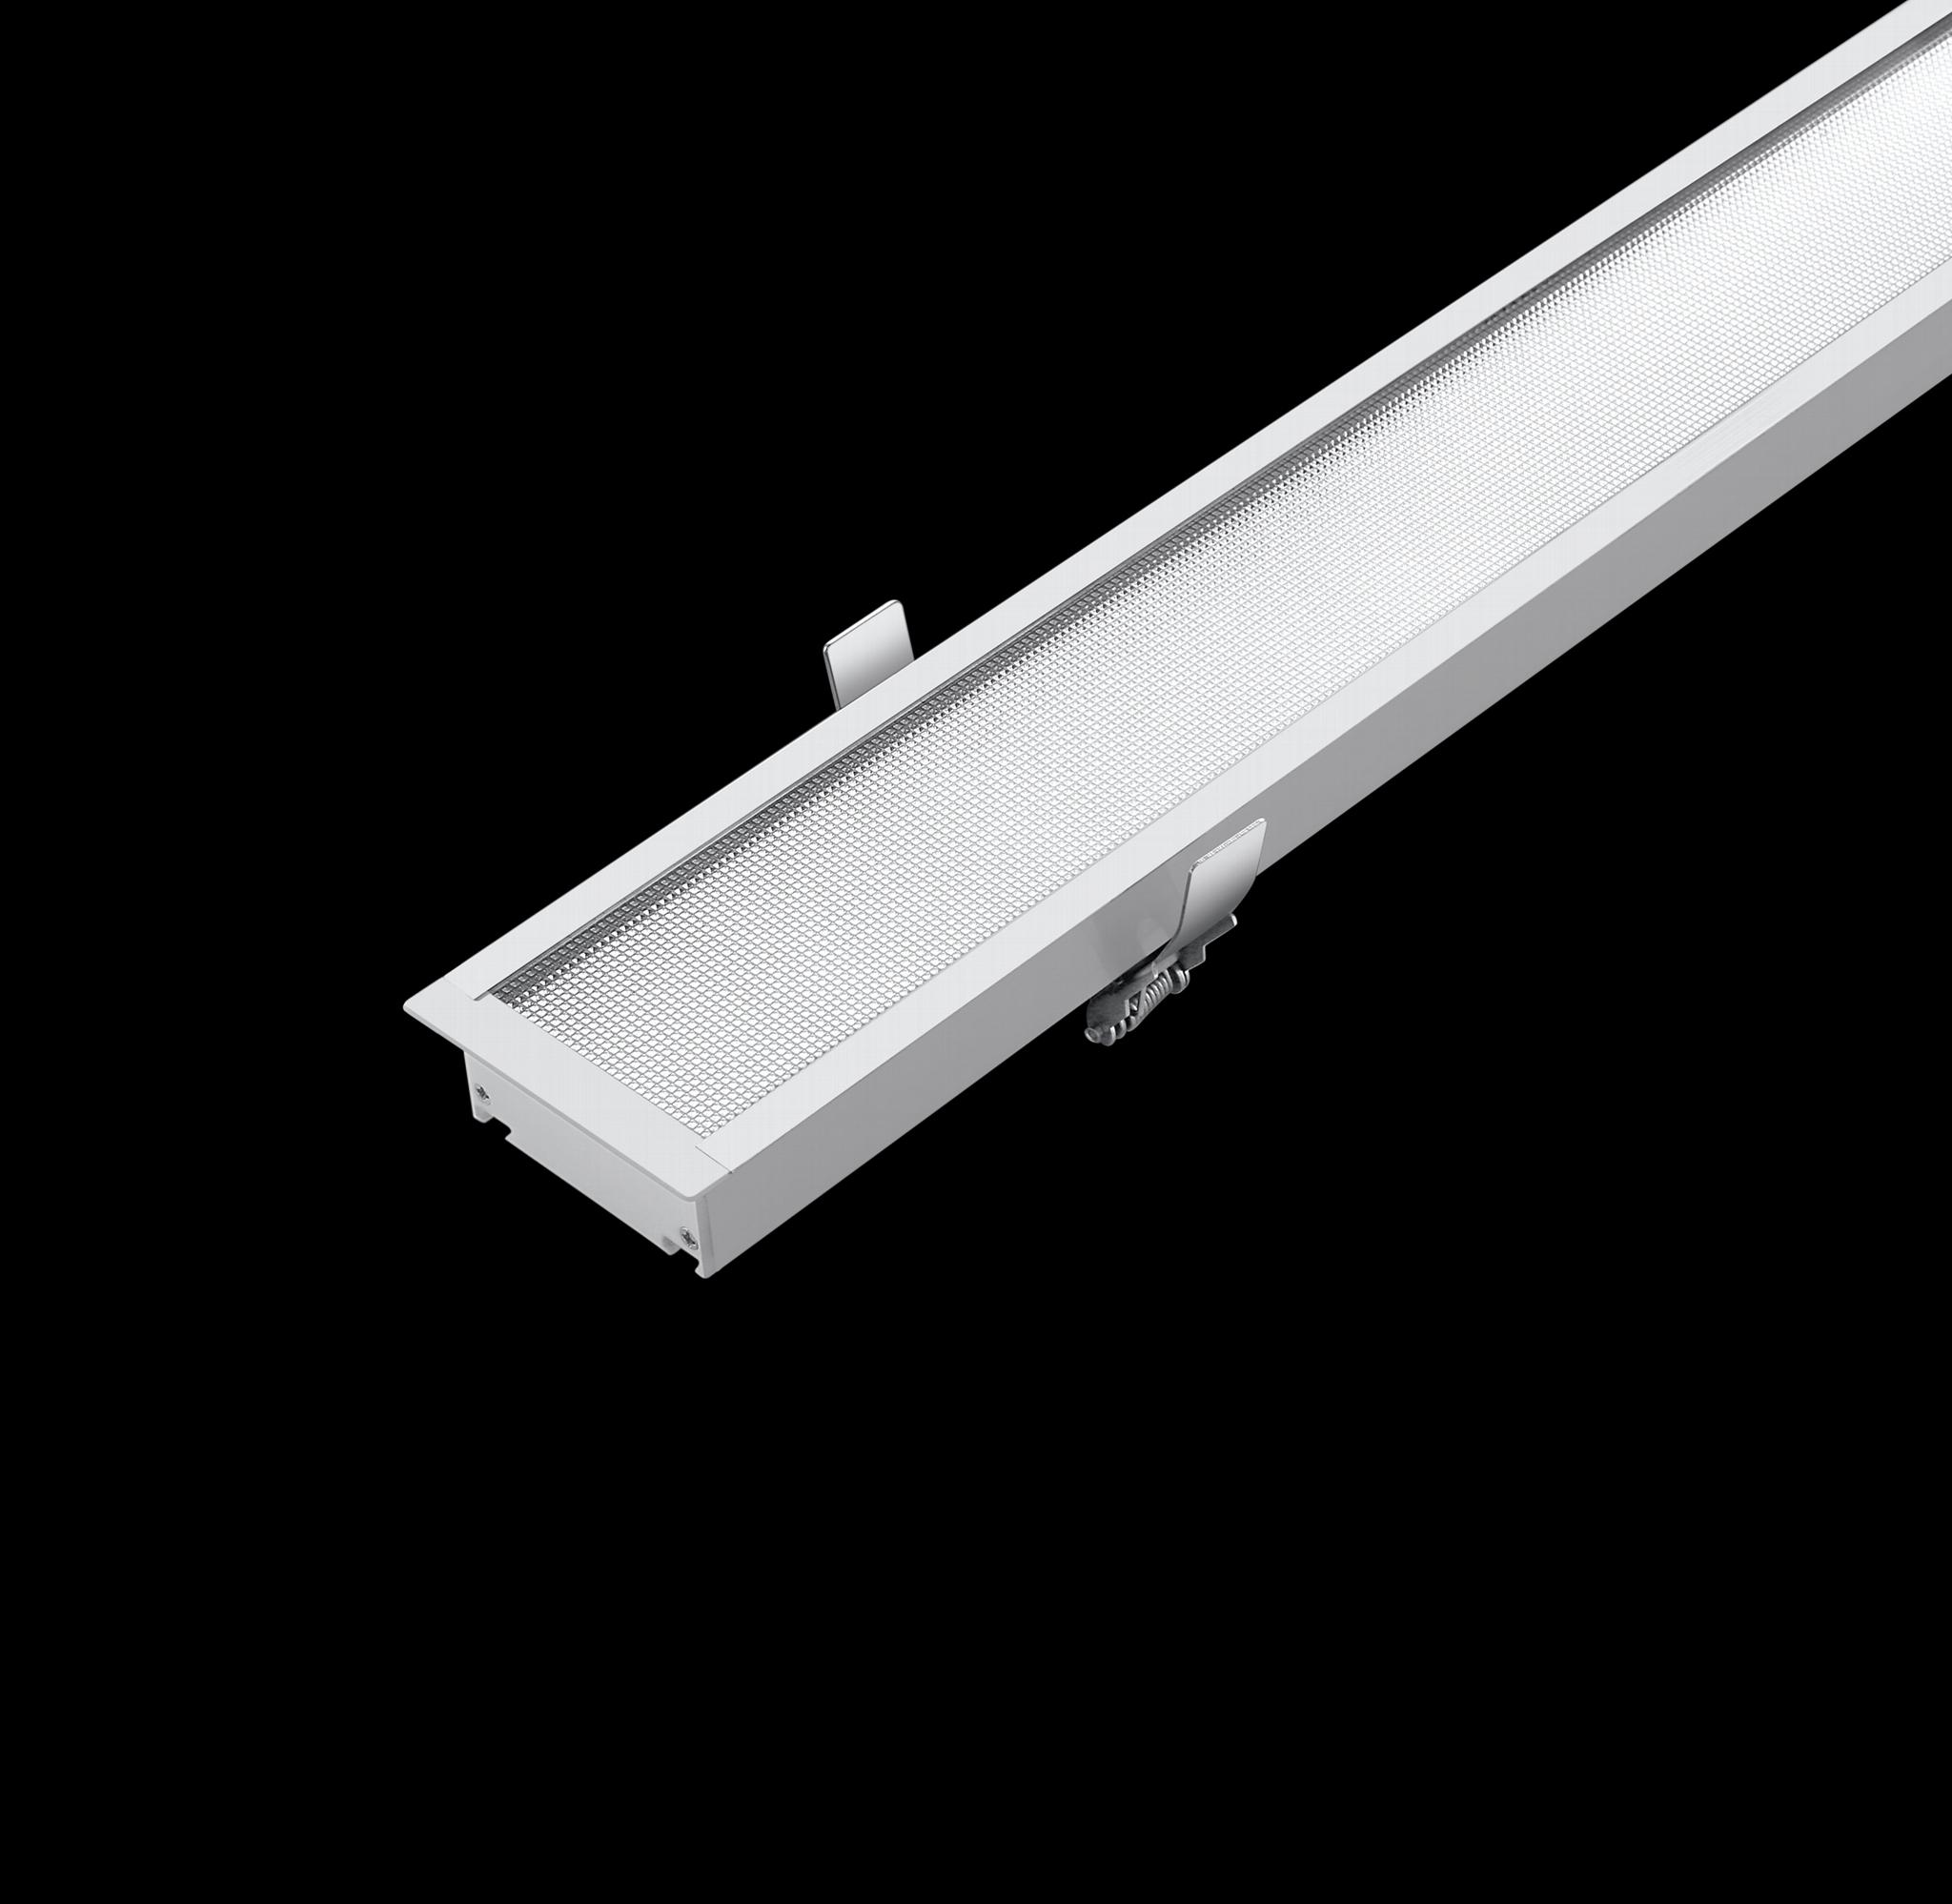 嵌入式LED線性燈 LE8030-PZ 5